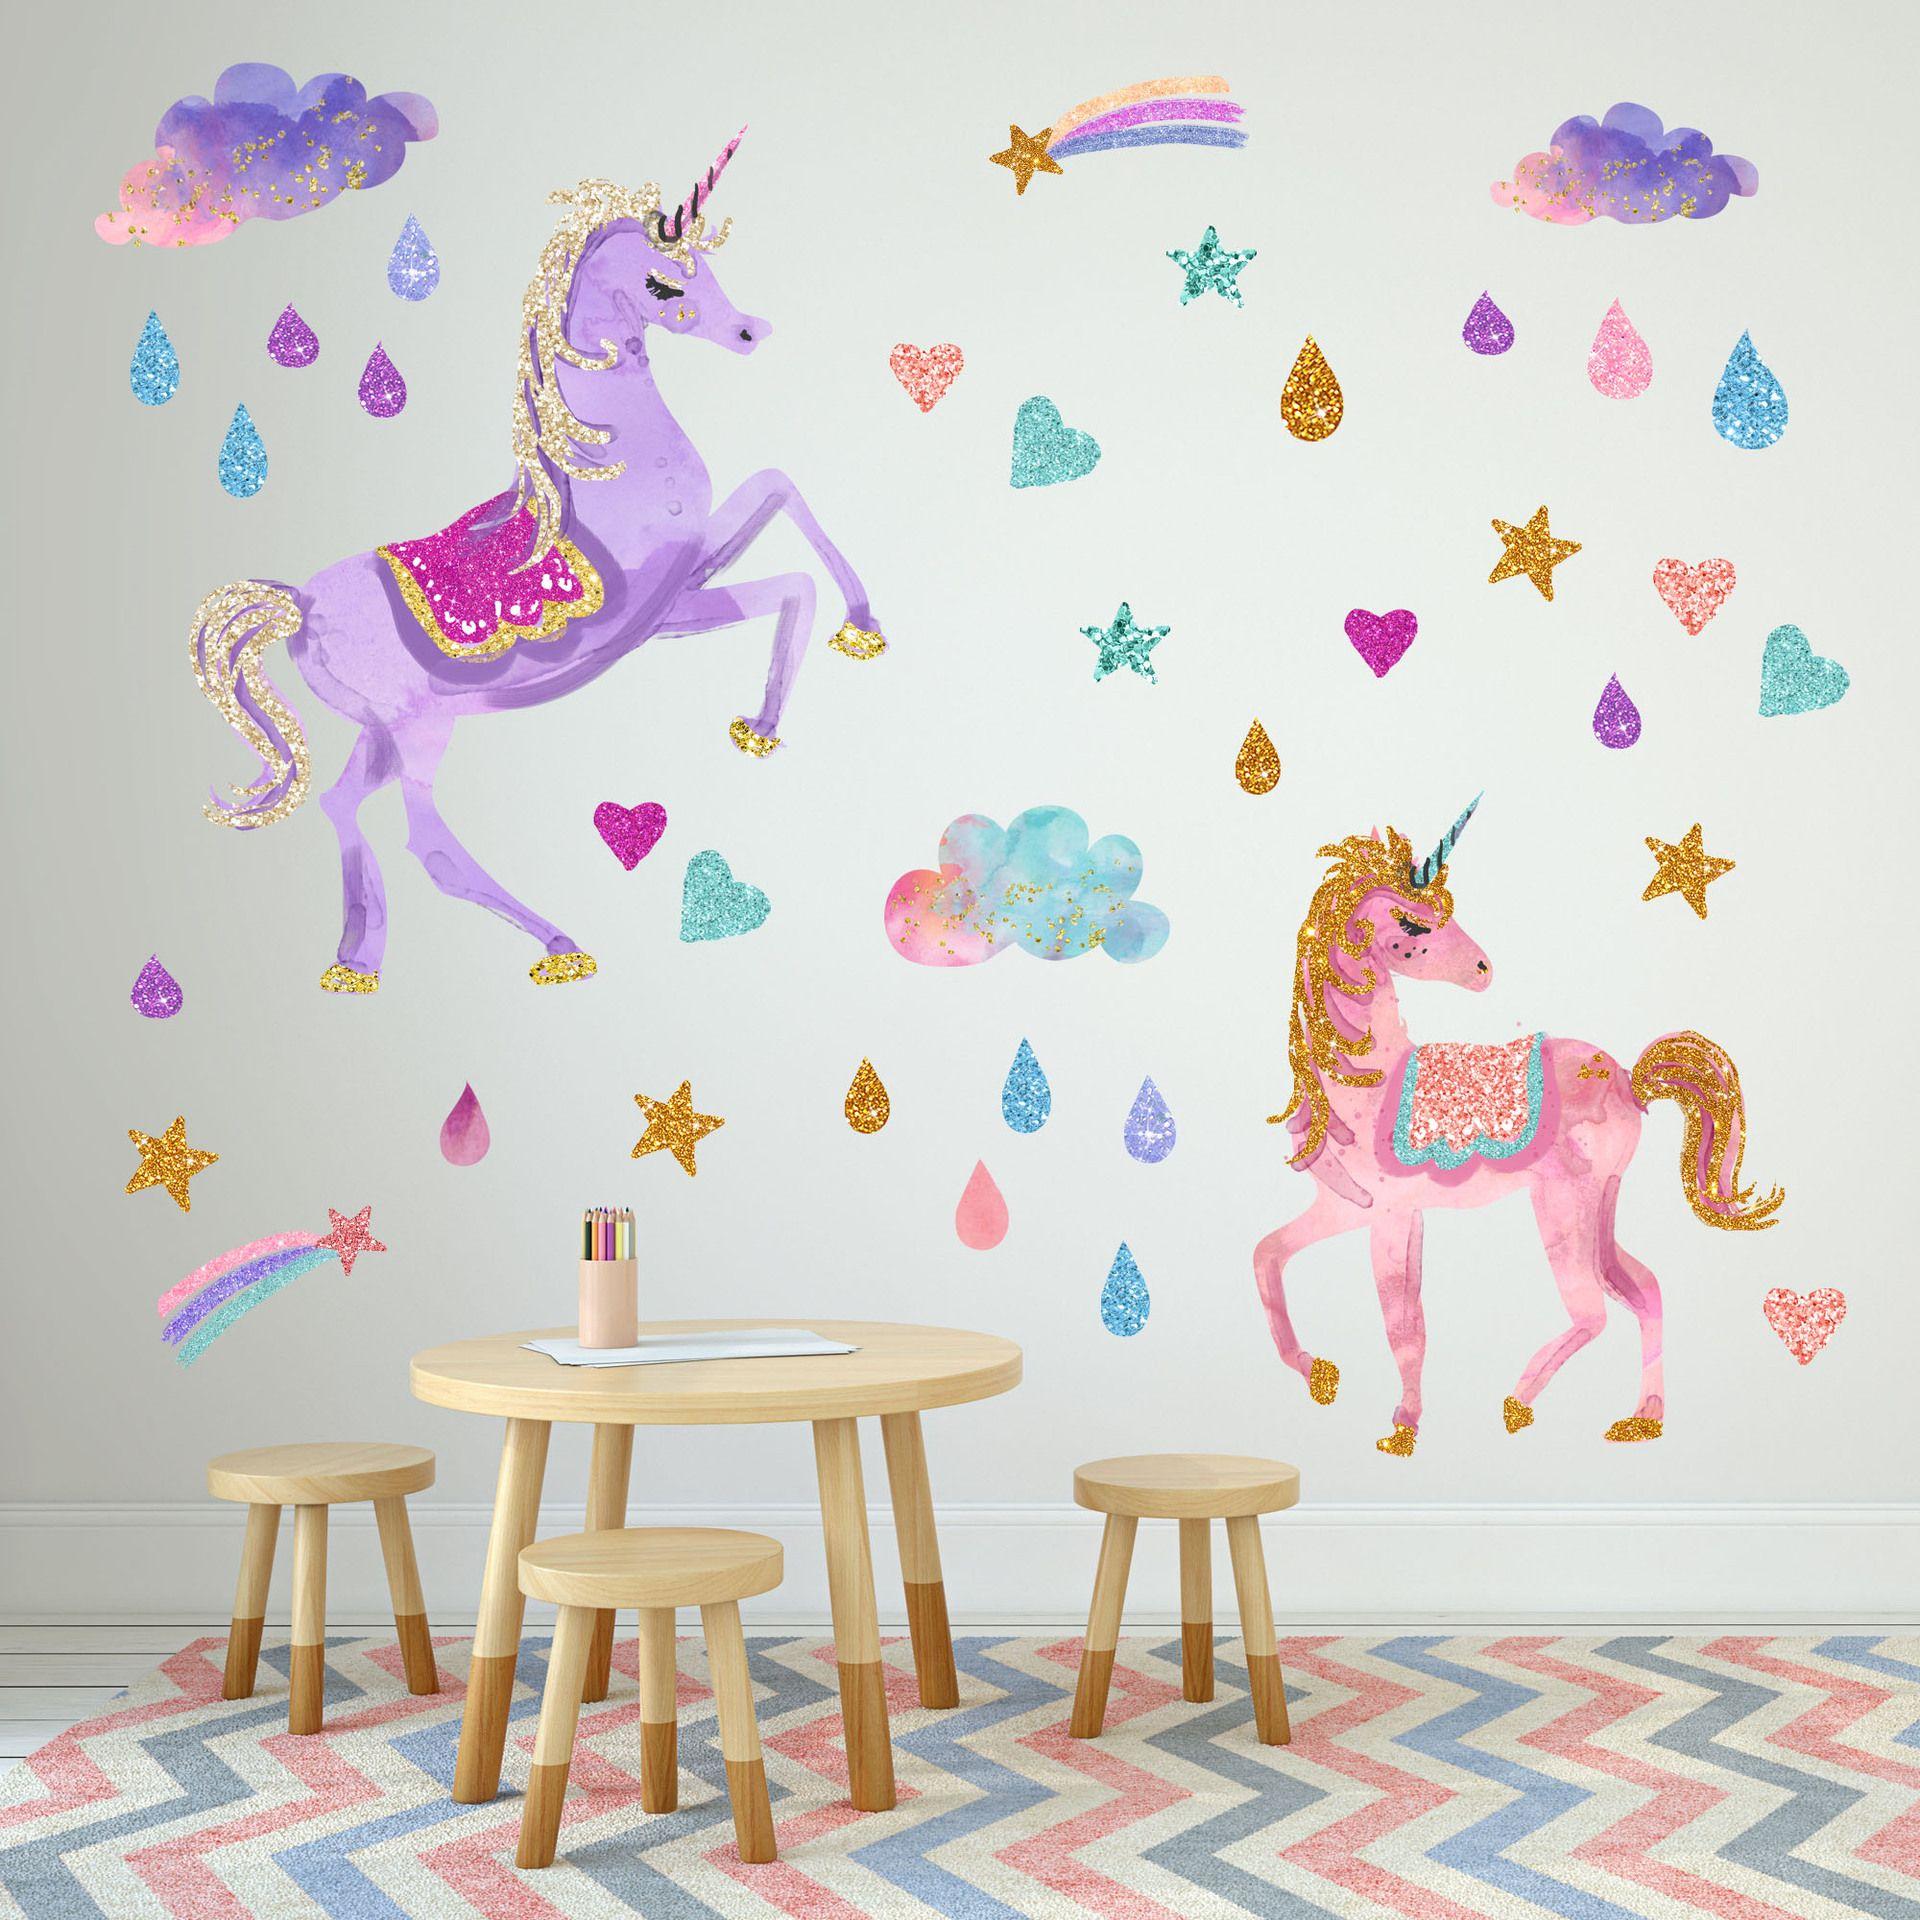 3660cm children unicorn wall sticker design kids cartoon pvc rainbow raindrop art wall stickers reflective wallpaper pictures home decor sports wall decals